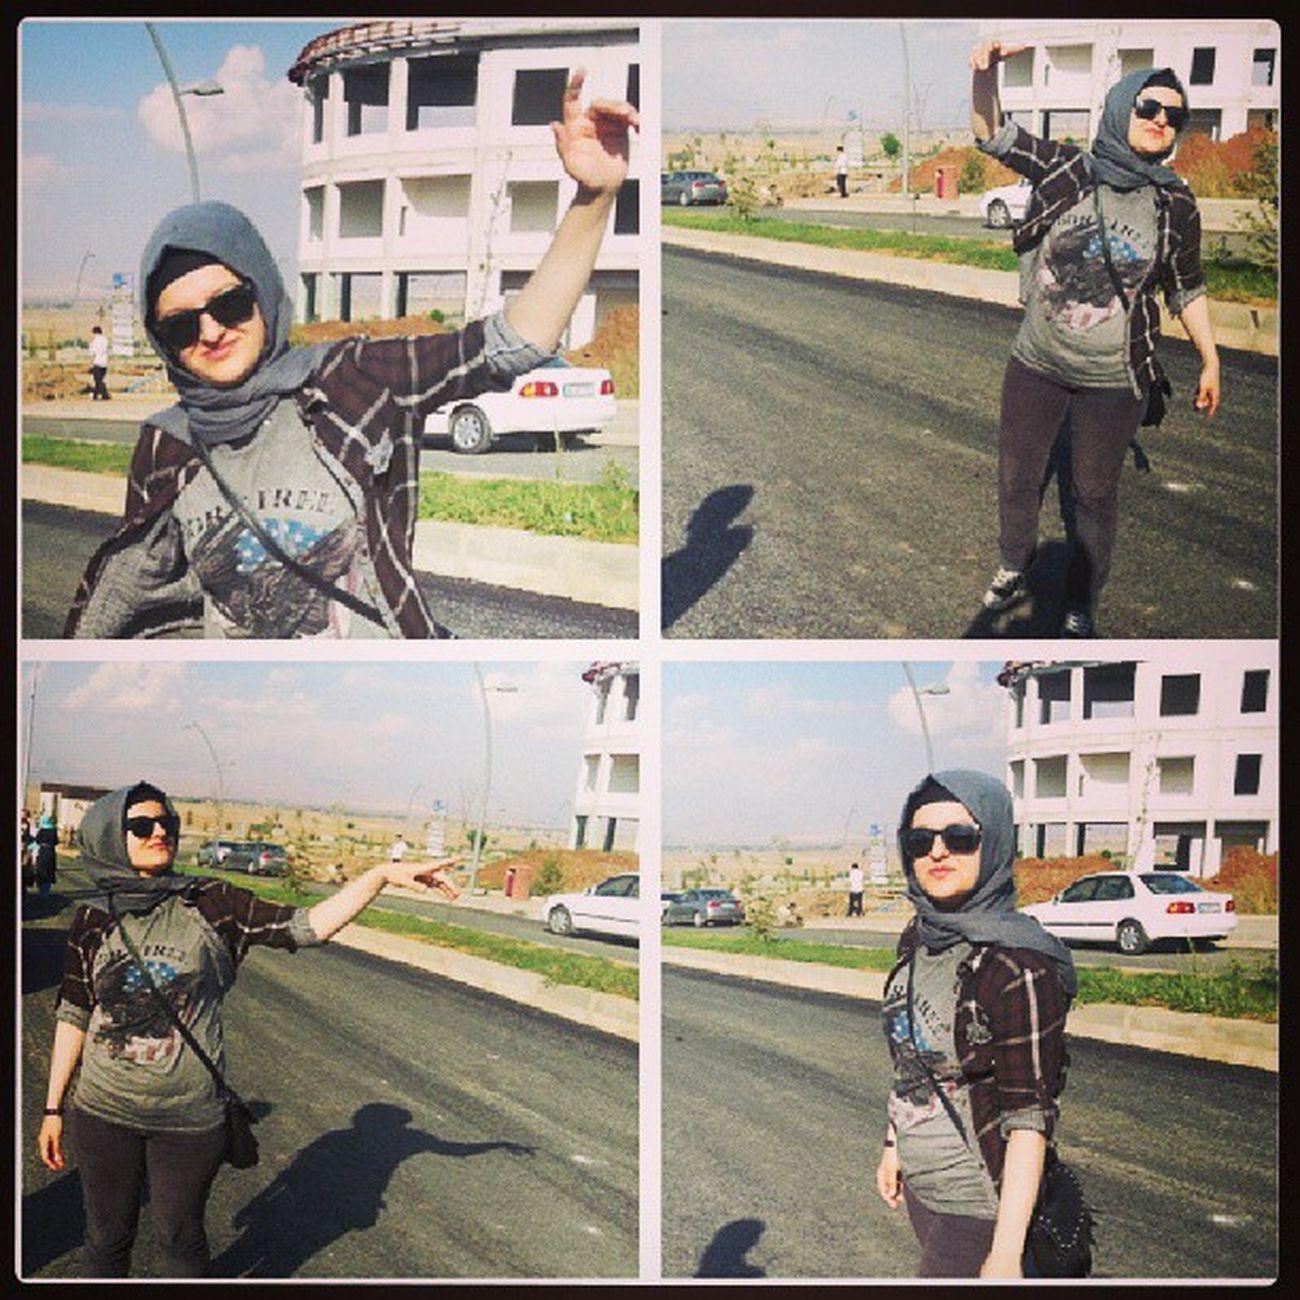 Mus Alparslan University Black sunglasses insaat bitmemis burasi yaa instalove instagood just me kutahya afyon